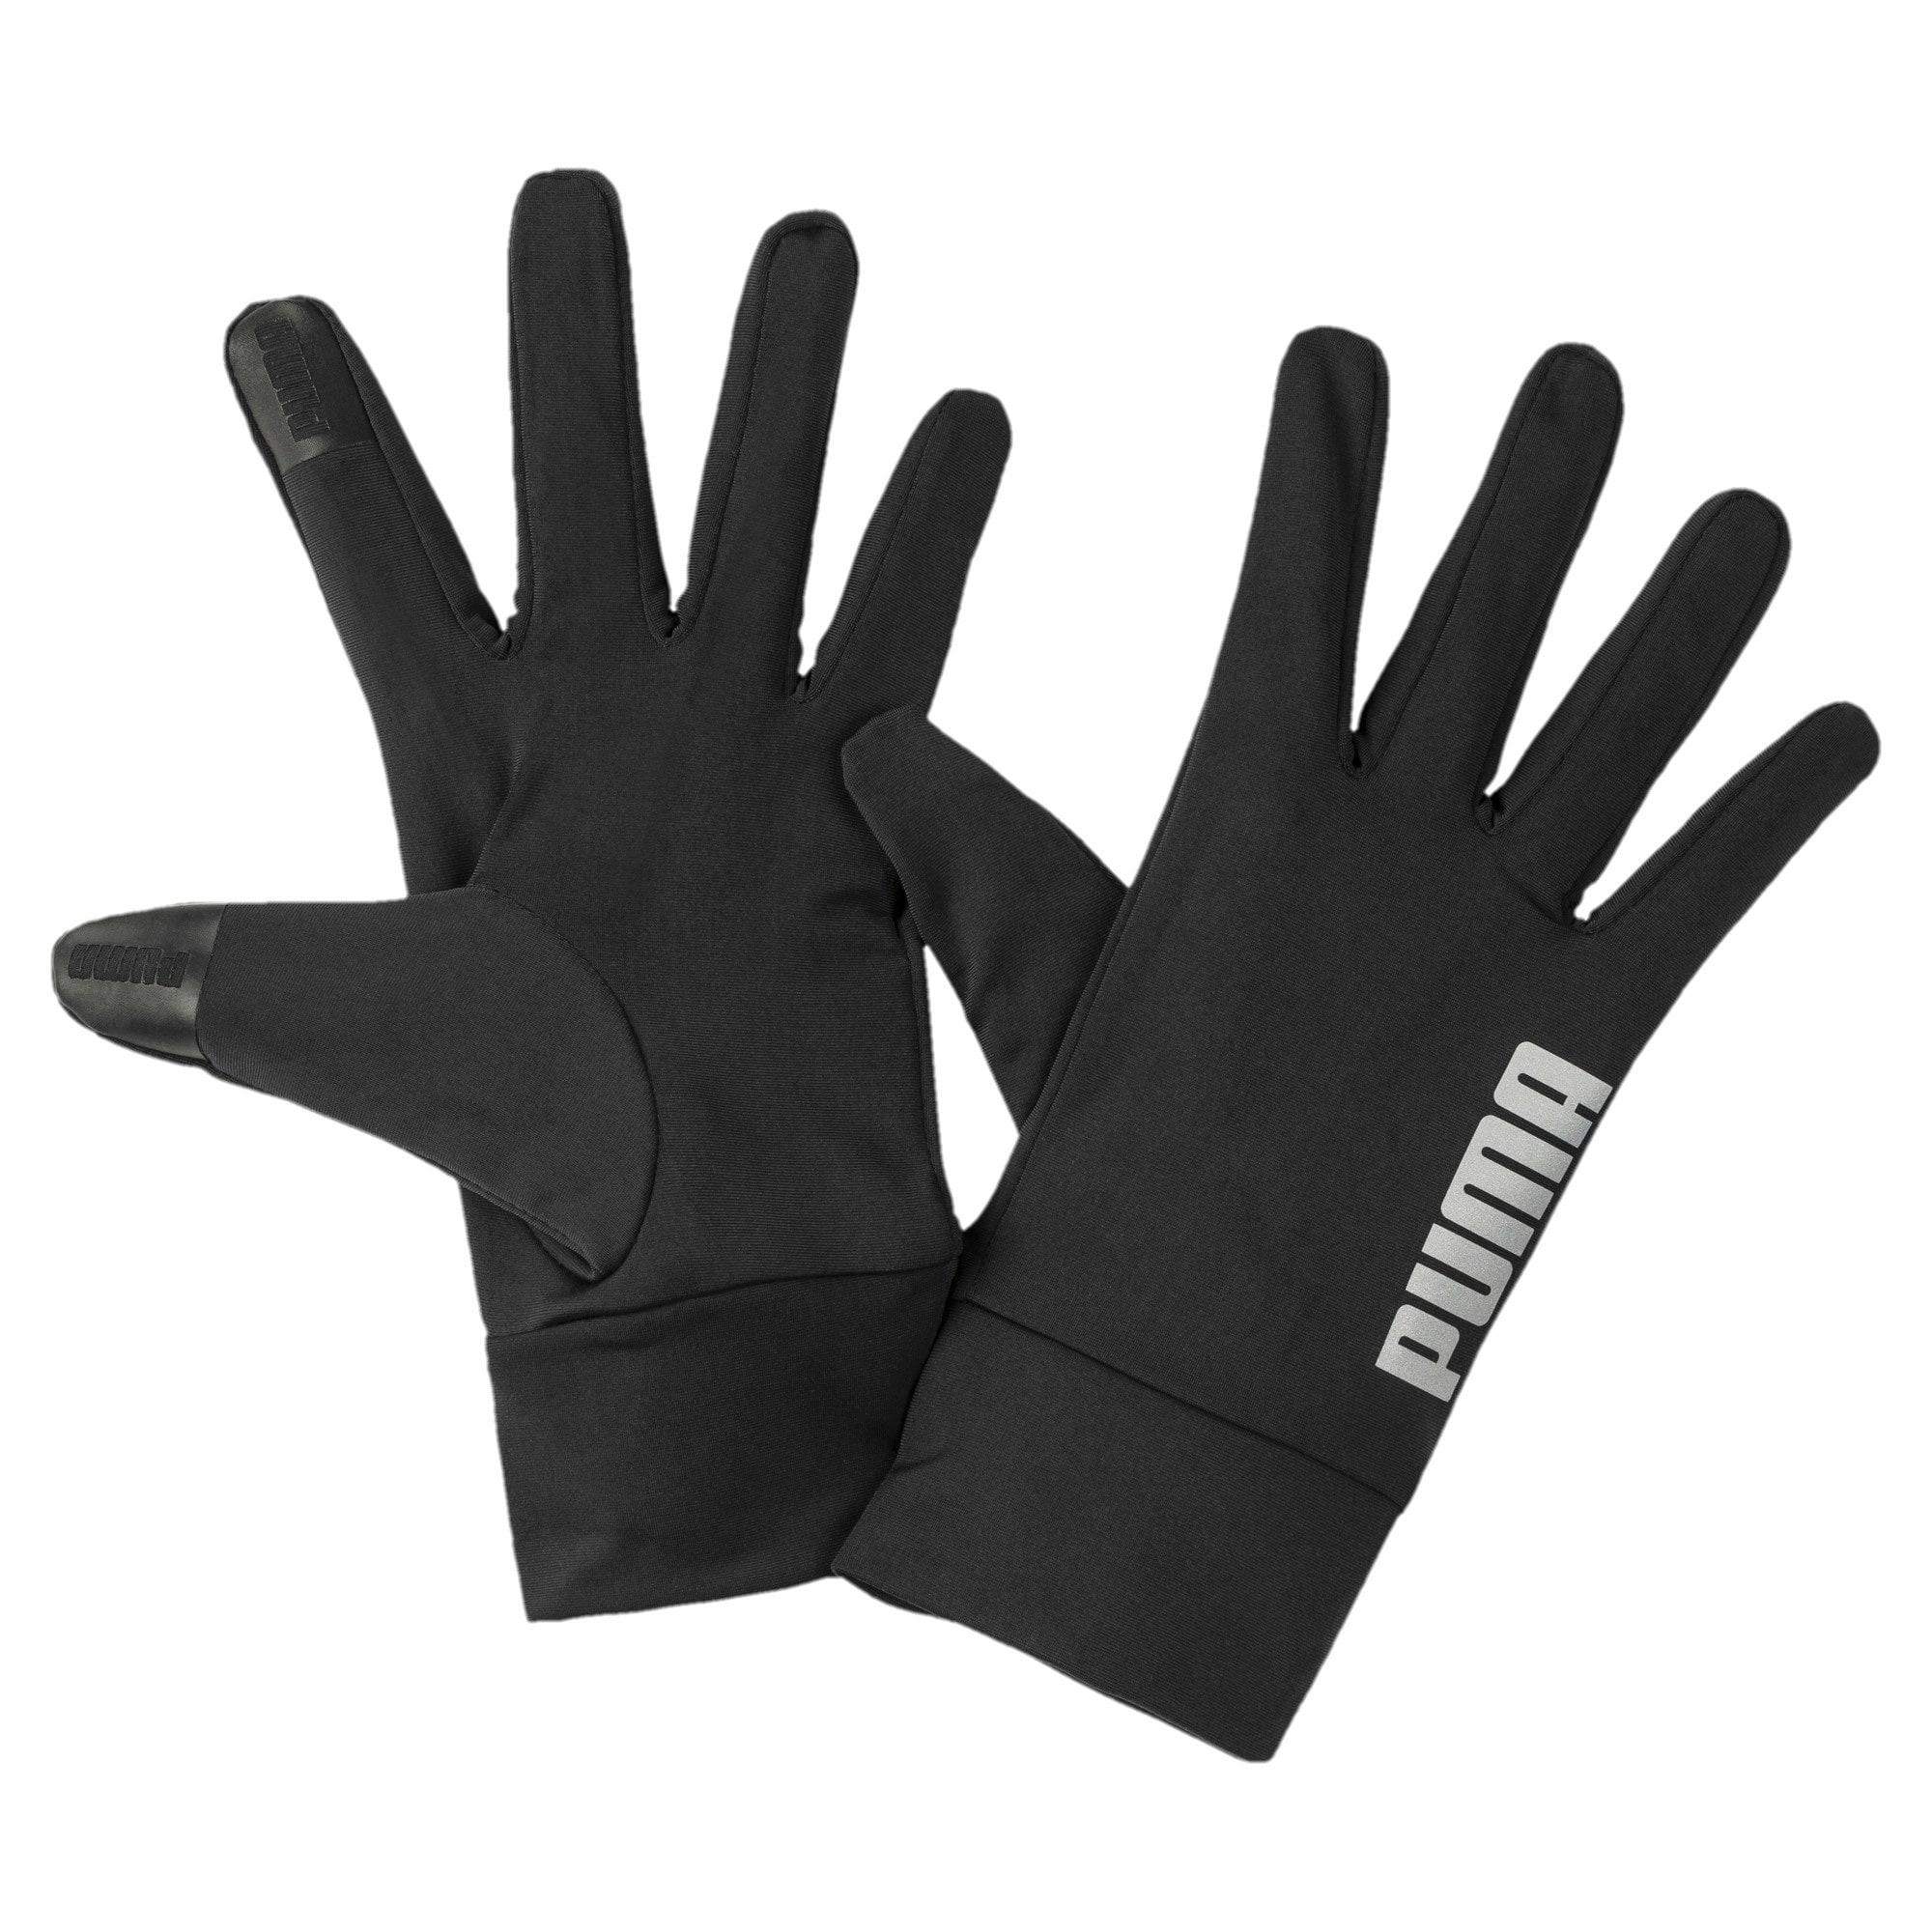 Thumbnail 1 of PR Performance Running Handschuhe, Puma Black, medium